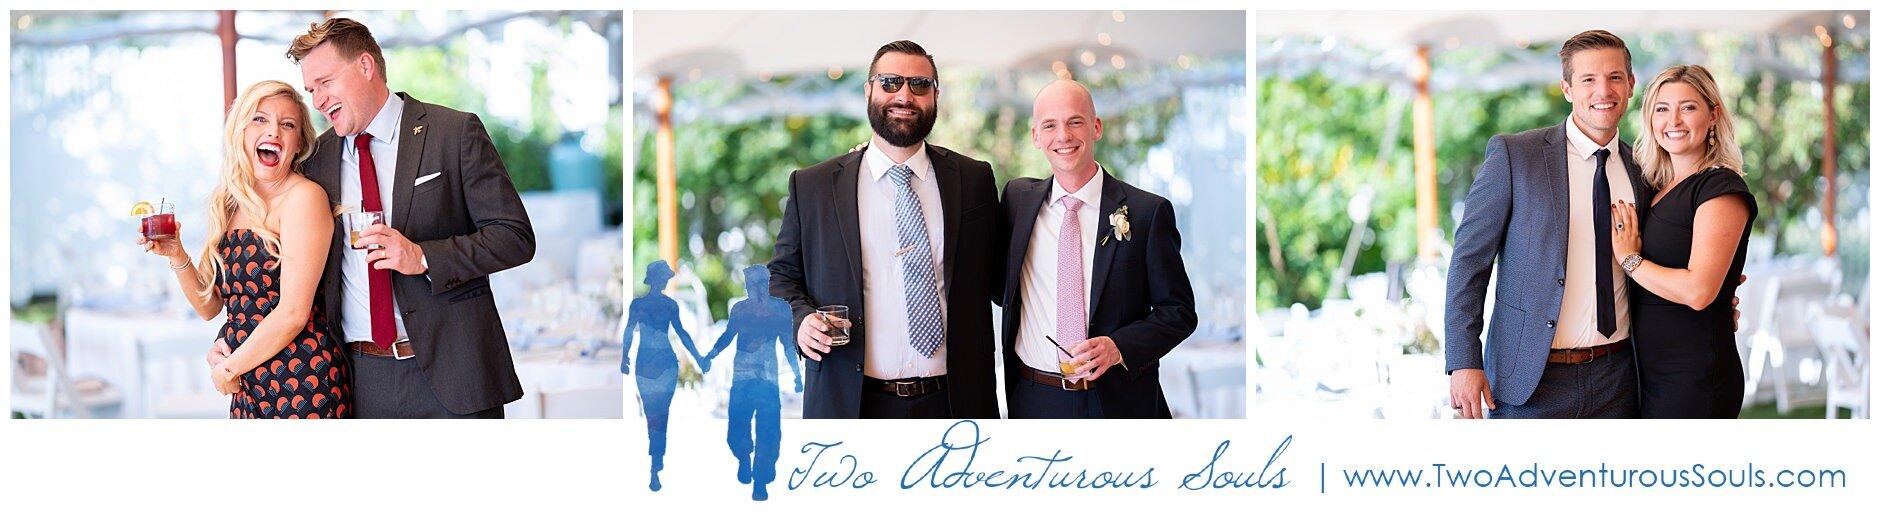 Breakwater Inn and Spa Wedding Photographers, Kennebunkport Wedding Photographers, Two Adventurous Souls- 092119_0041.jpg